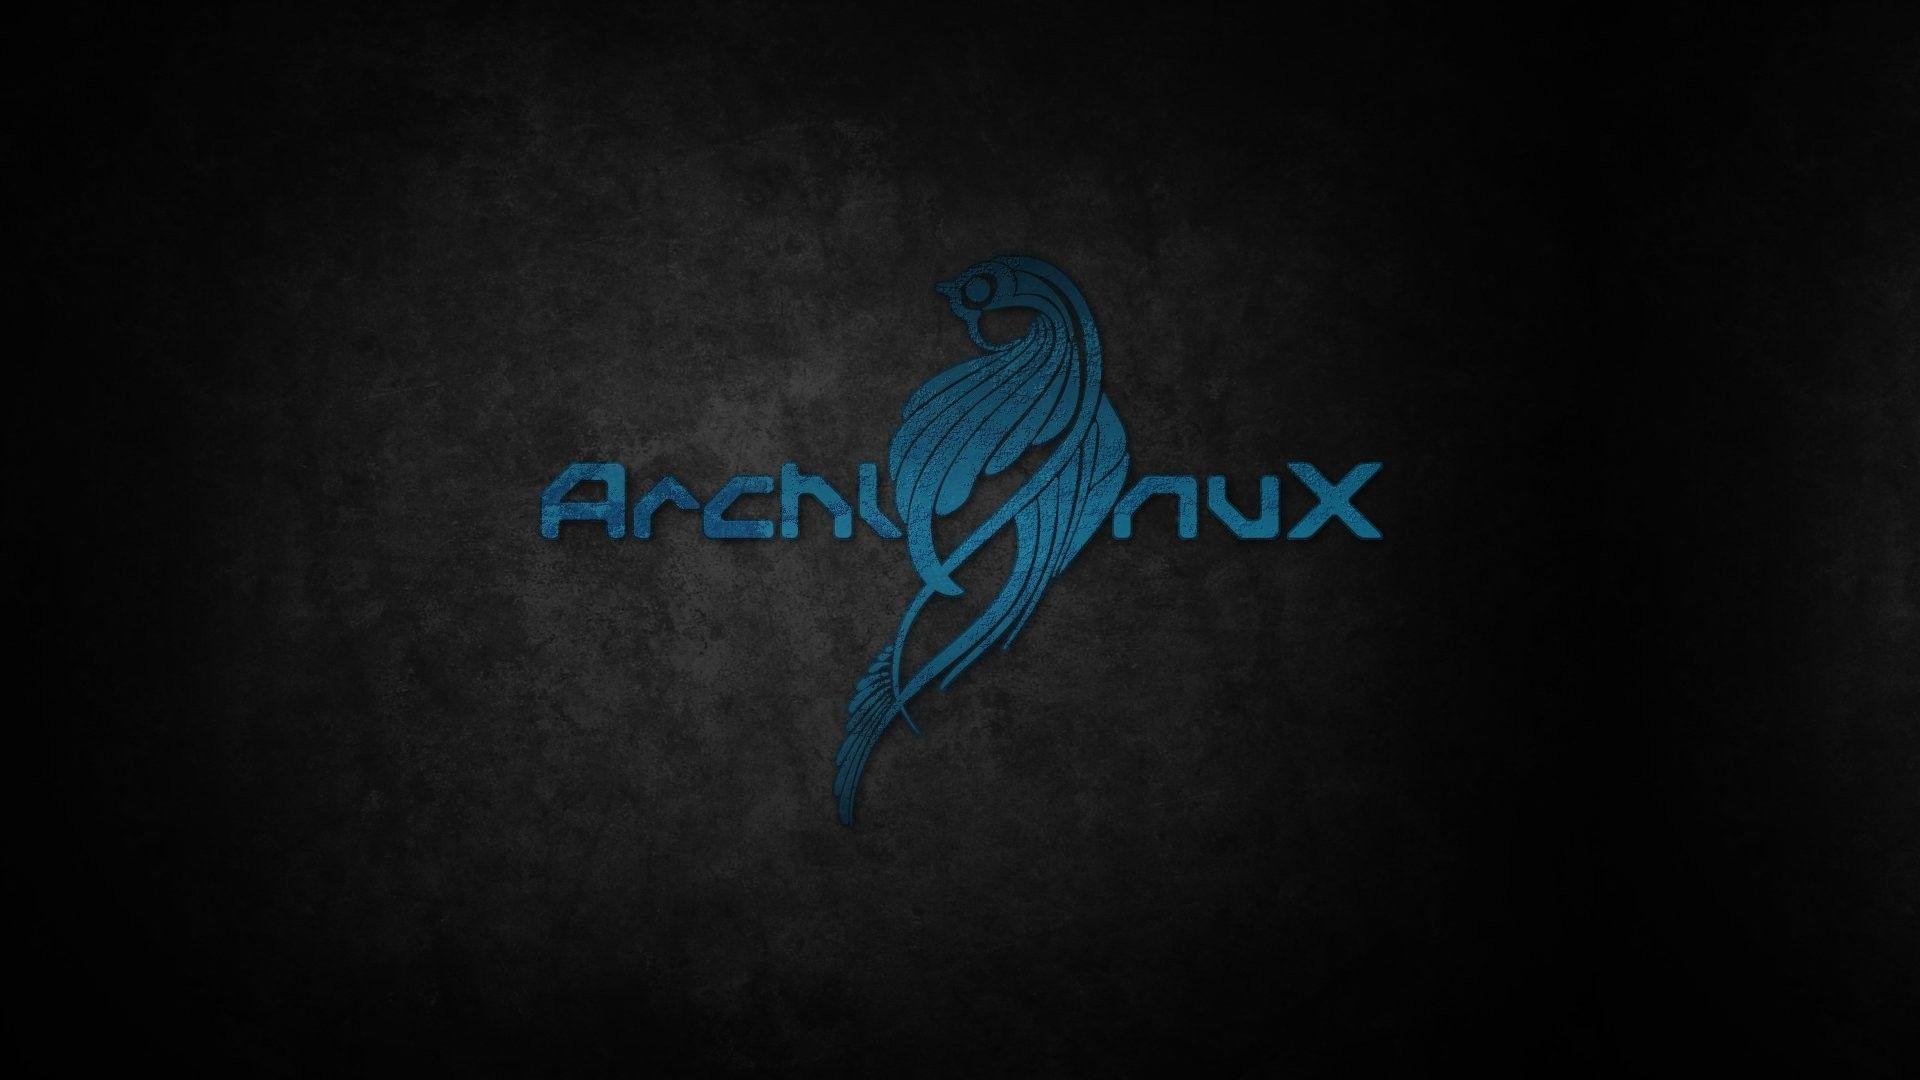 Arch computer wallpaper